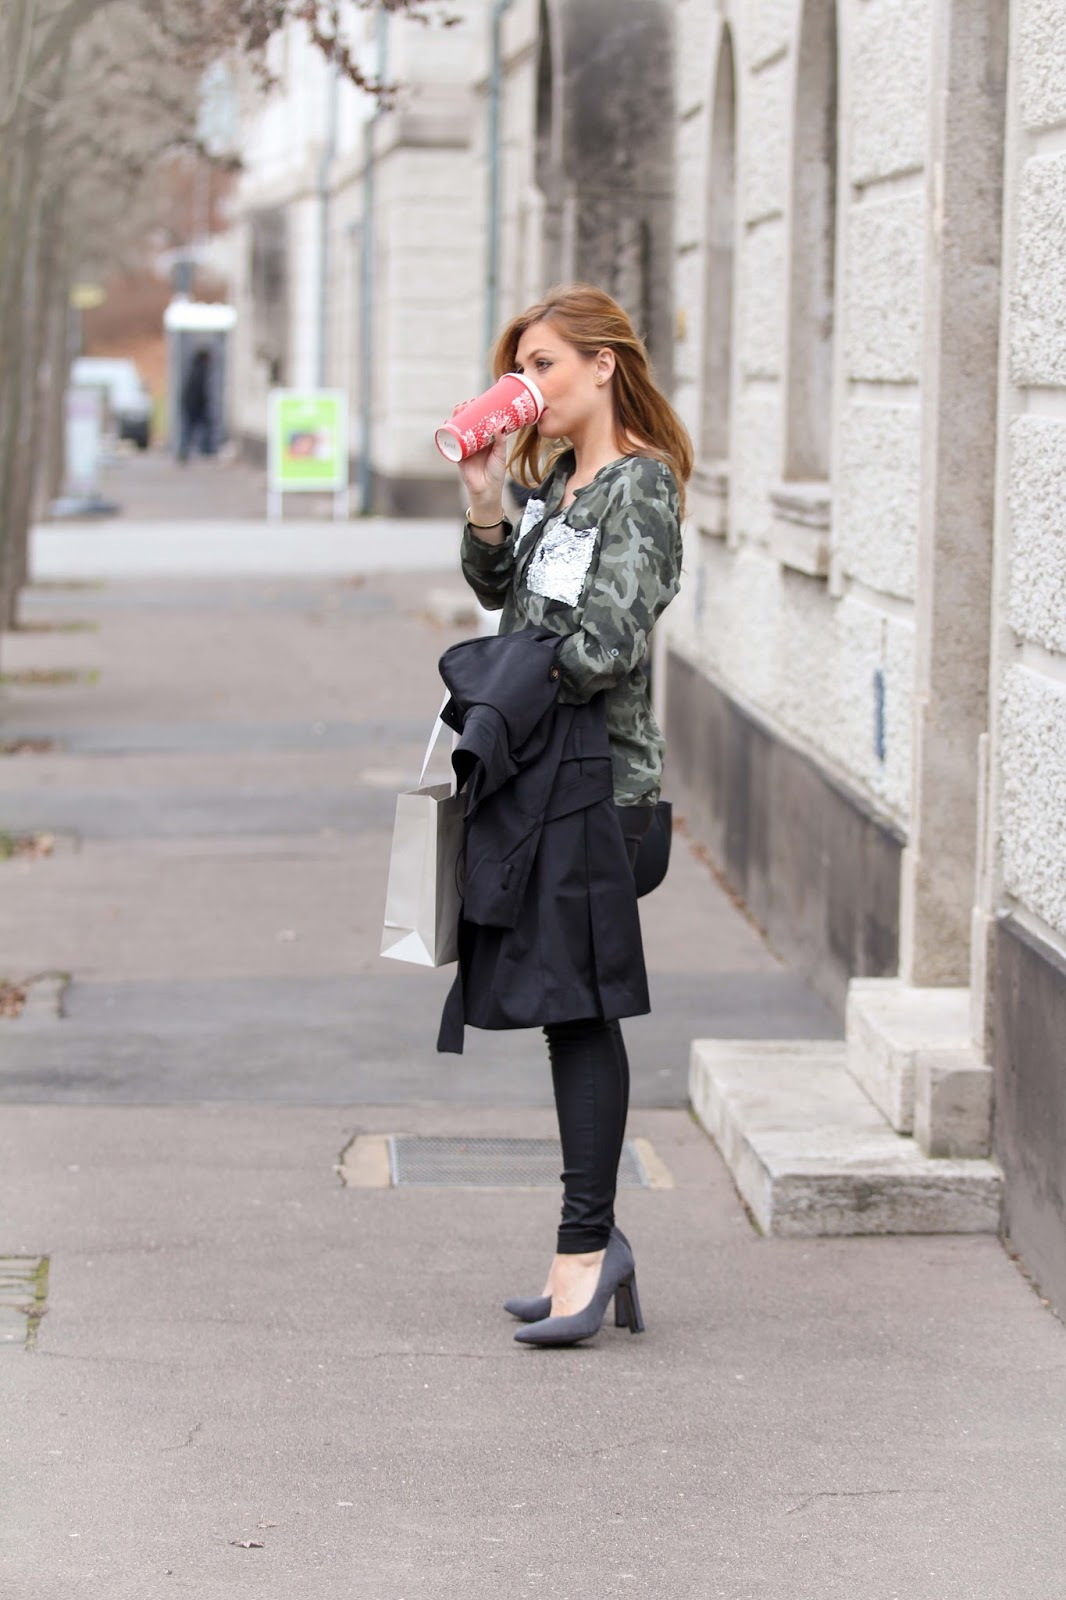 -fashionblog-muenchen-munich-blogger-fashionblogger-bloggerdeutschland-lifestyleblog-modeblog-muenchen-germanblogger-styleblog-bundfaltenhose-a-la-streetwear